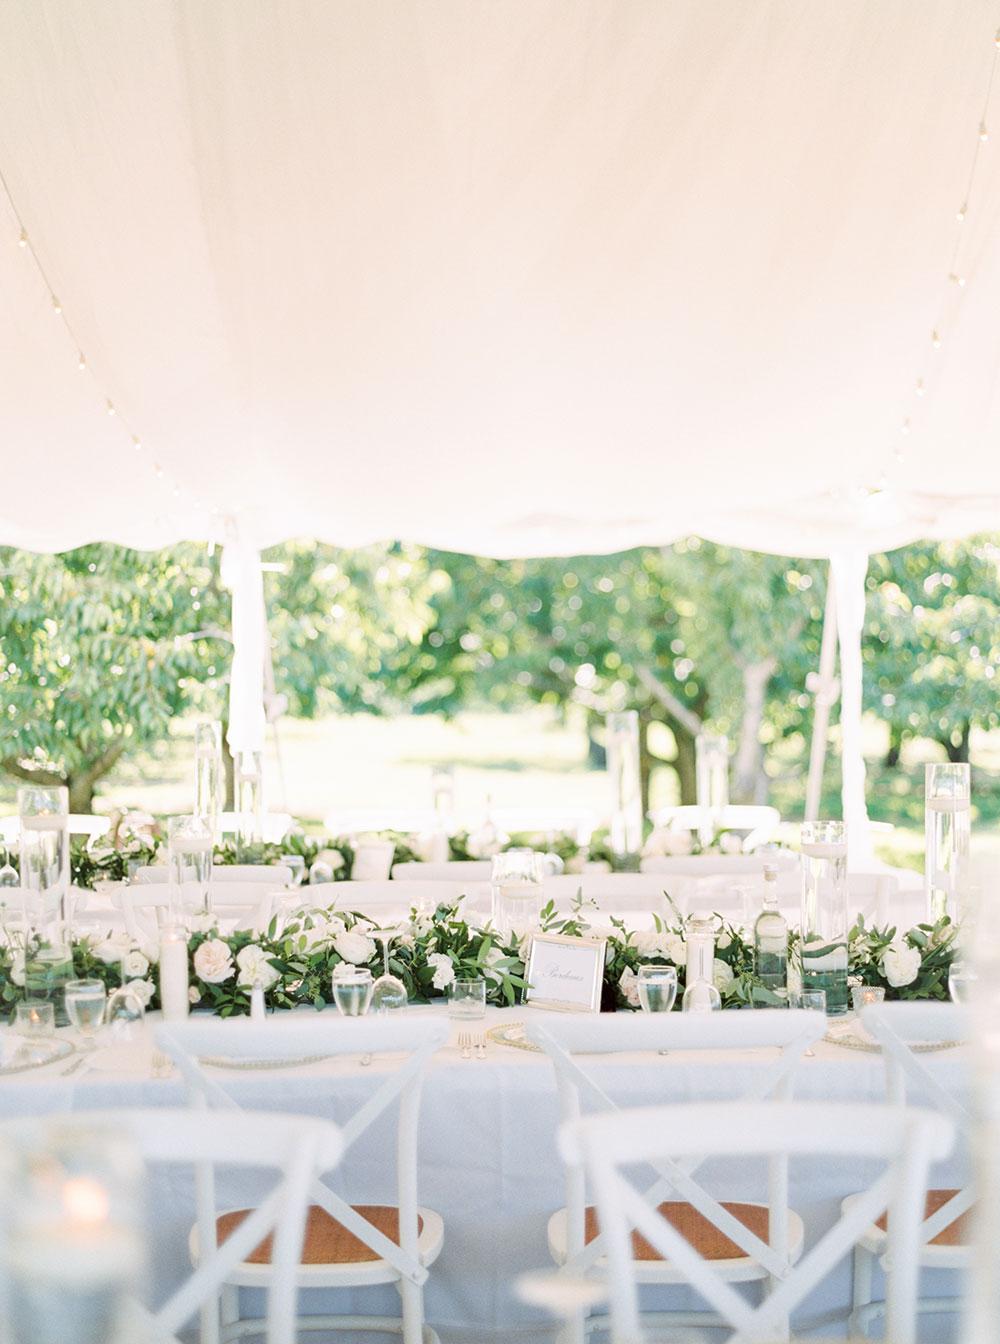 kurtz-orchards-wedding-gracewood-estate-niagara-on-the-lake-photo-by-katie-nicolle-photography-0078.JPG